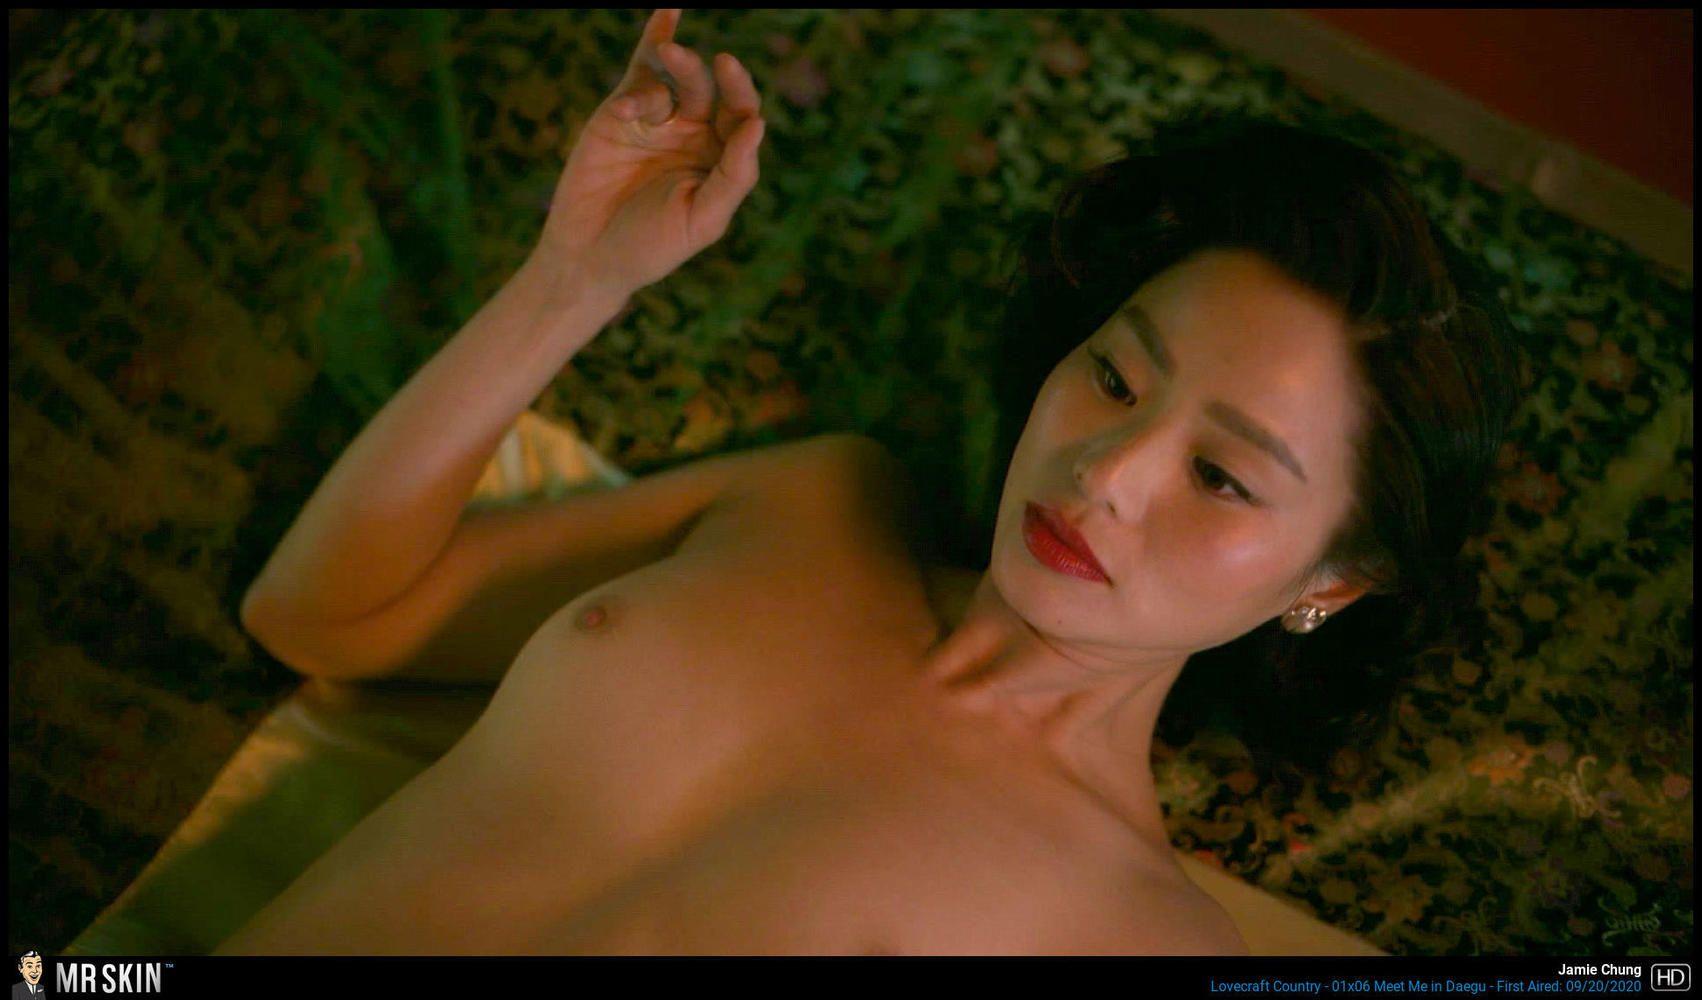 Topless Nude Realworld Cast Scenes